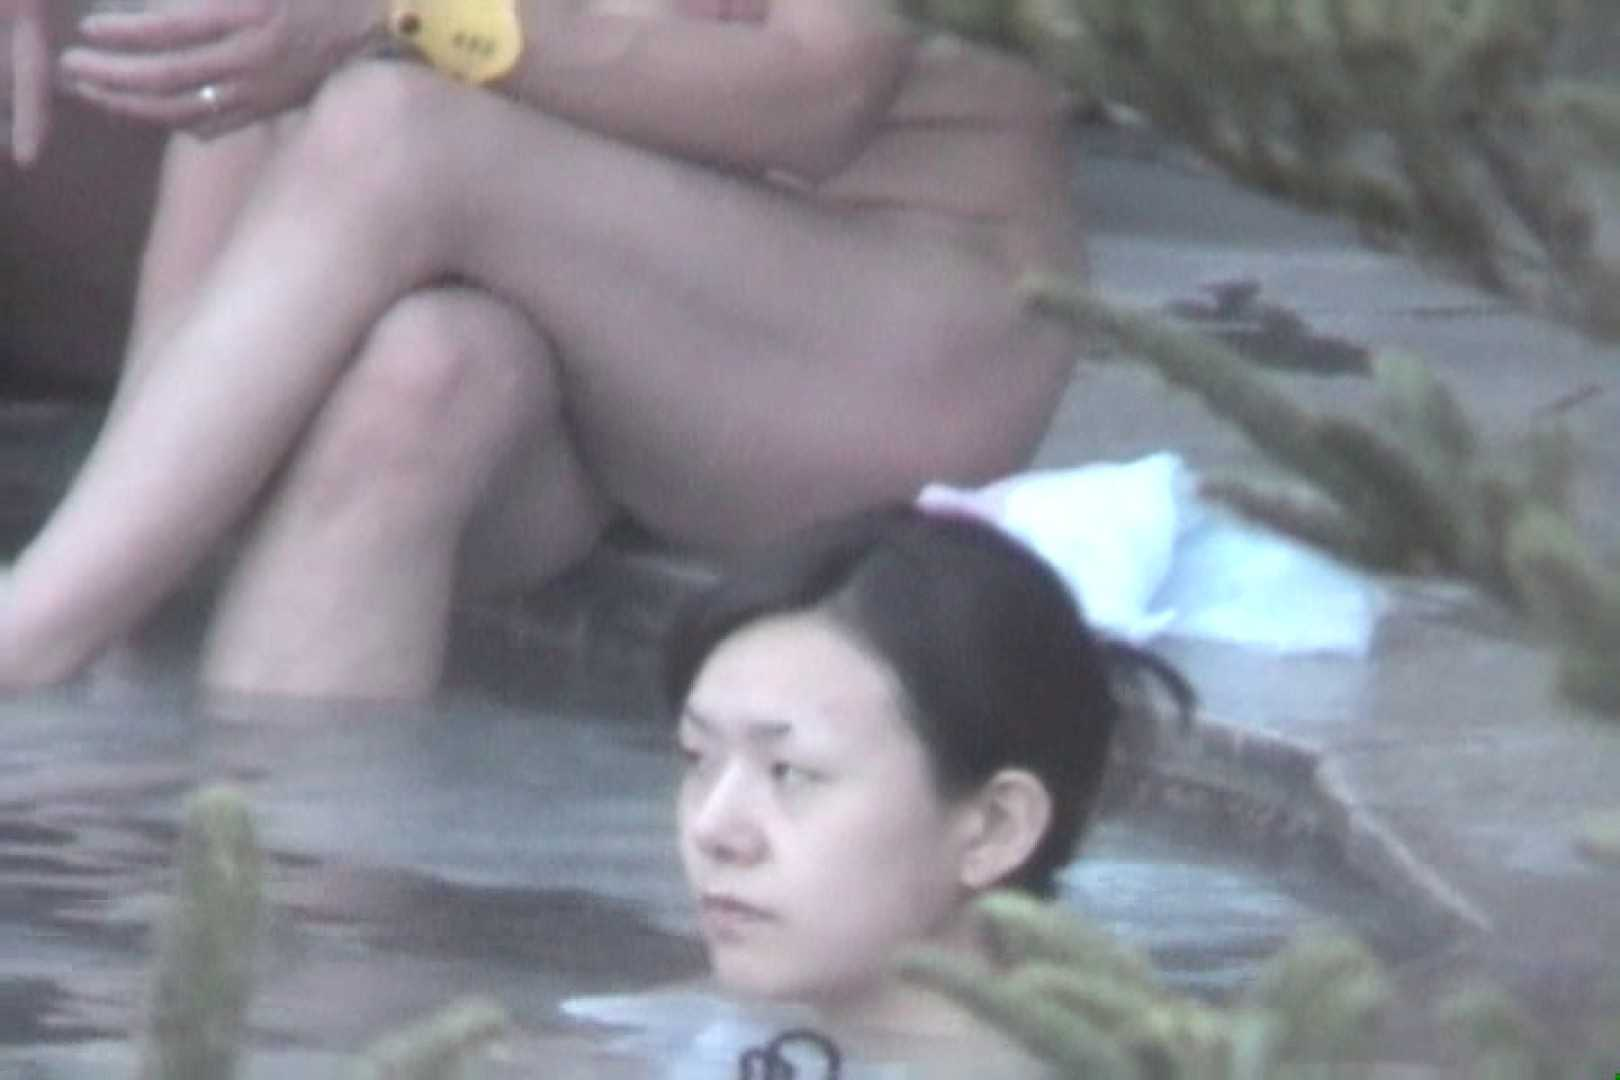 Aquaな露天風呂Vol.609 盗撮シリーズ   露天風呂編  107PIX 7